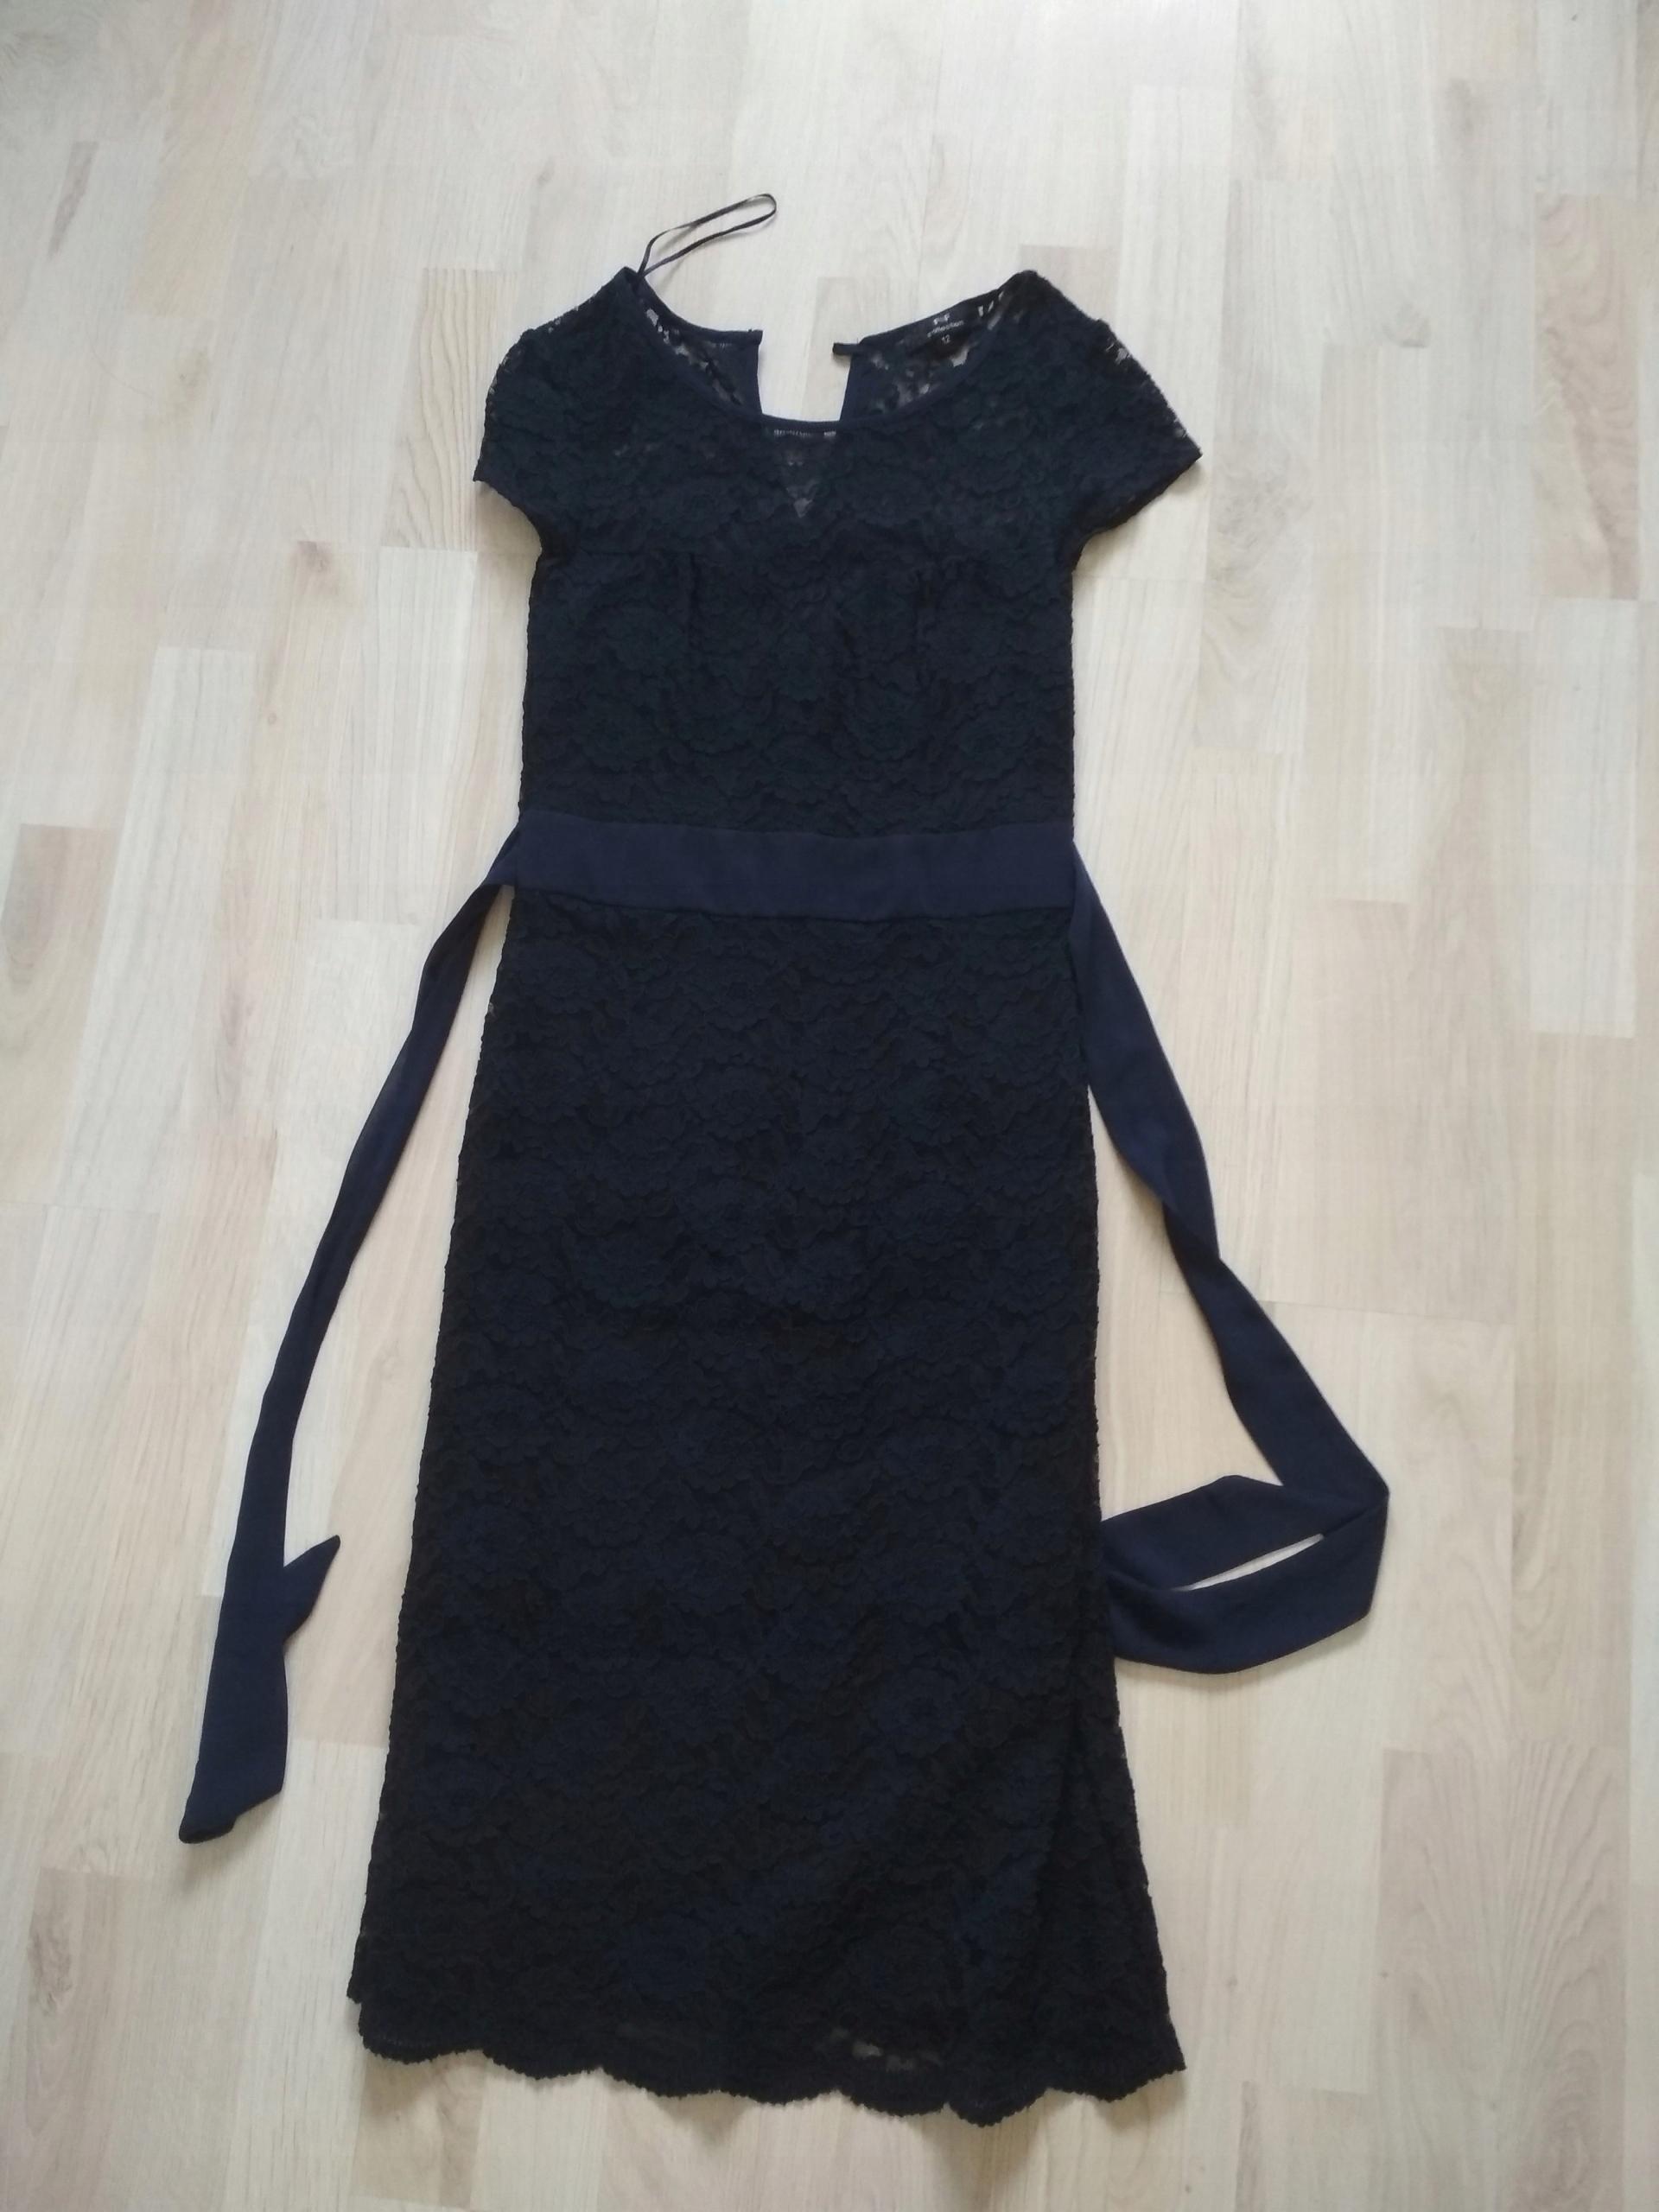 290d2babf5 Sukienka koronkowa f f r. 38 - 7548218761 - oficjalne archiwum allegro